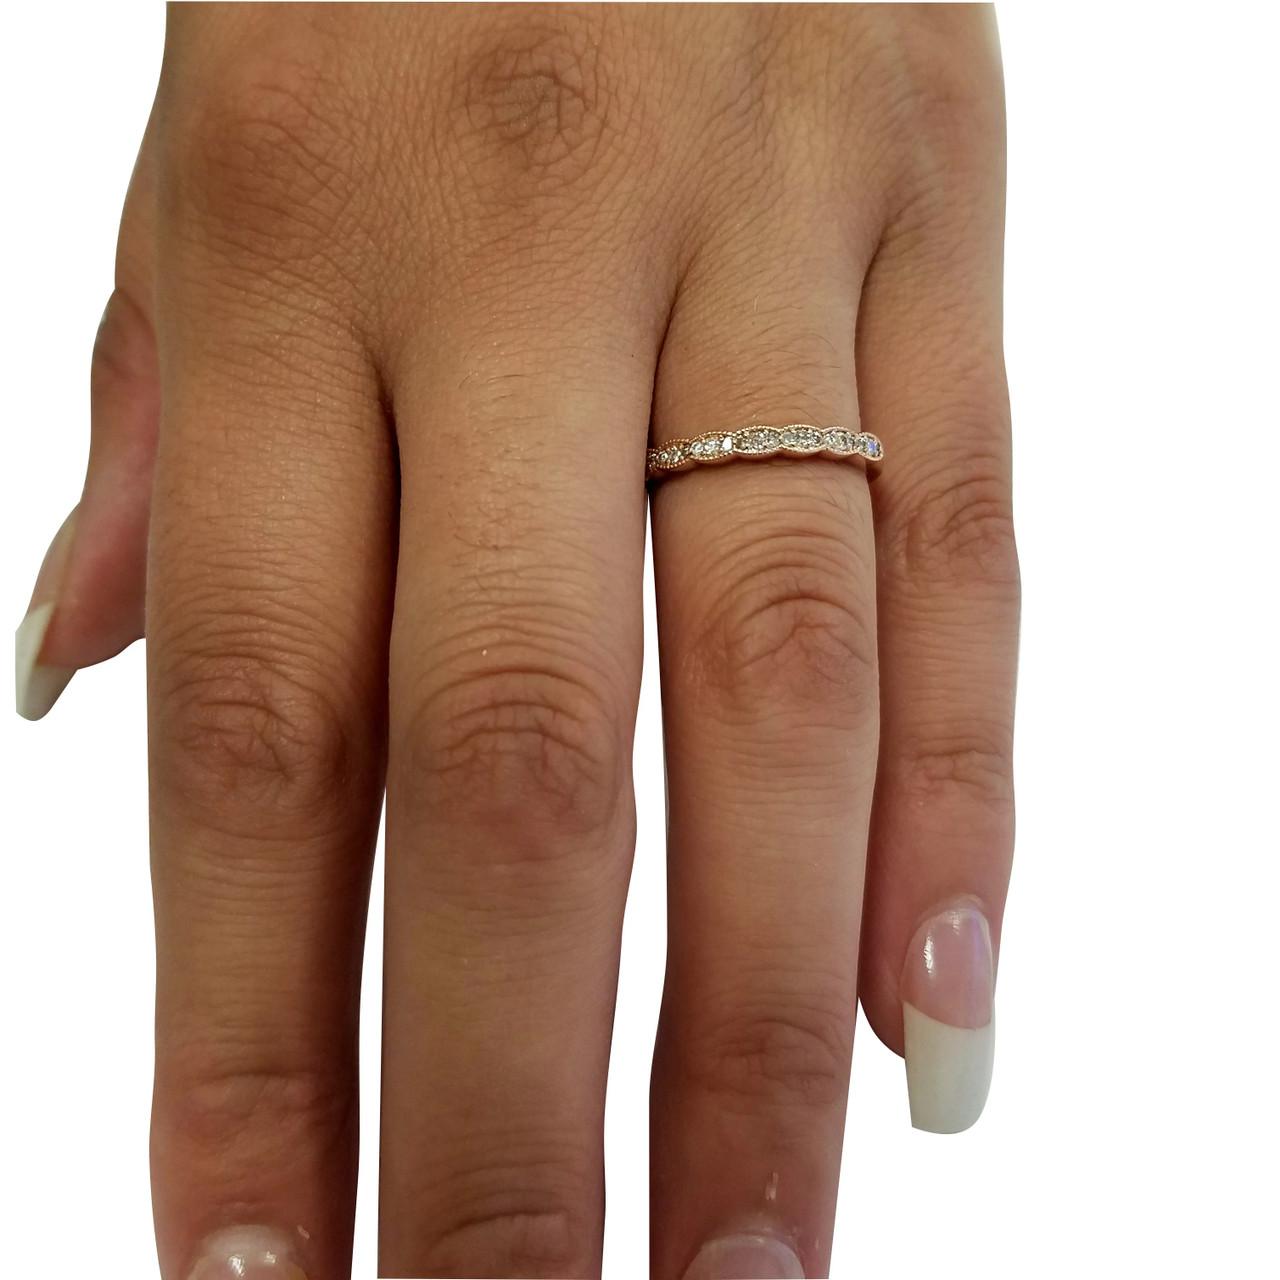 15 cttw Diamond Stackable Womens Wedding Ring 14k Rose Gold